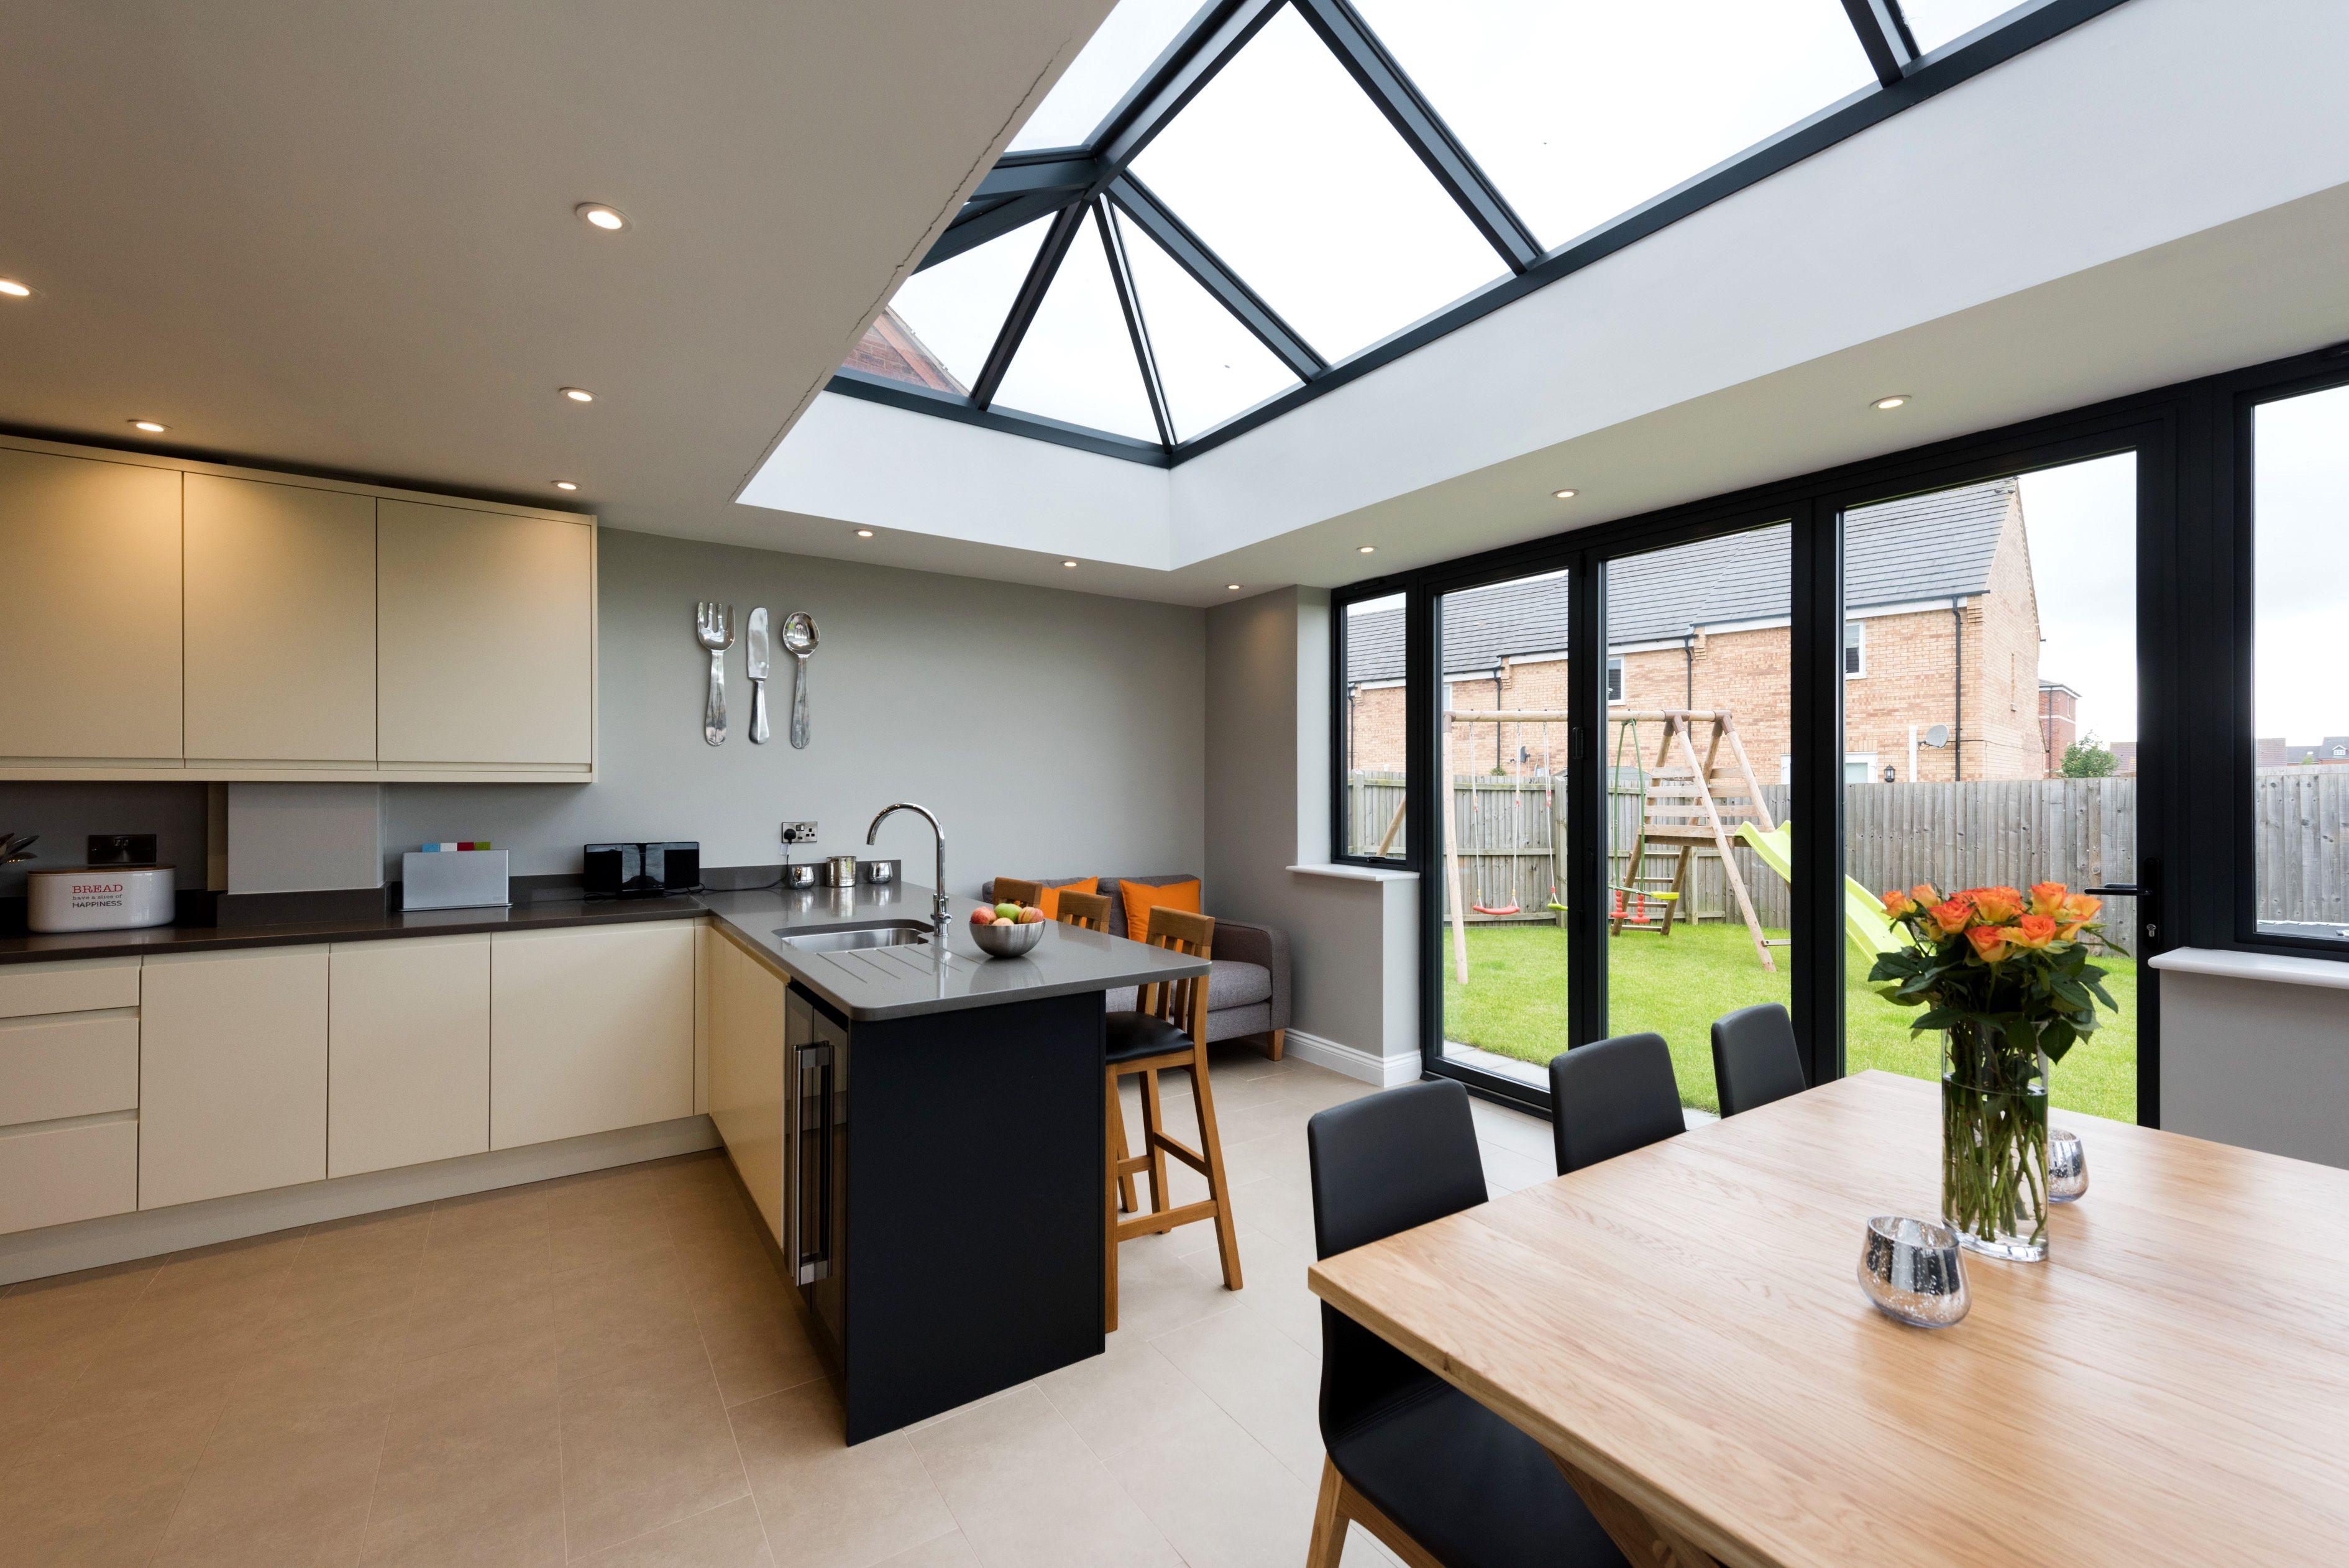 Image Result For Kitchen Extension Open Plan Kitchen Living Room Interior Design Kitchen Open Plan Kitchen Dining Living